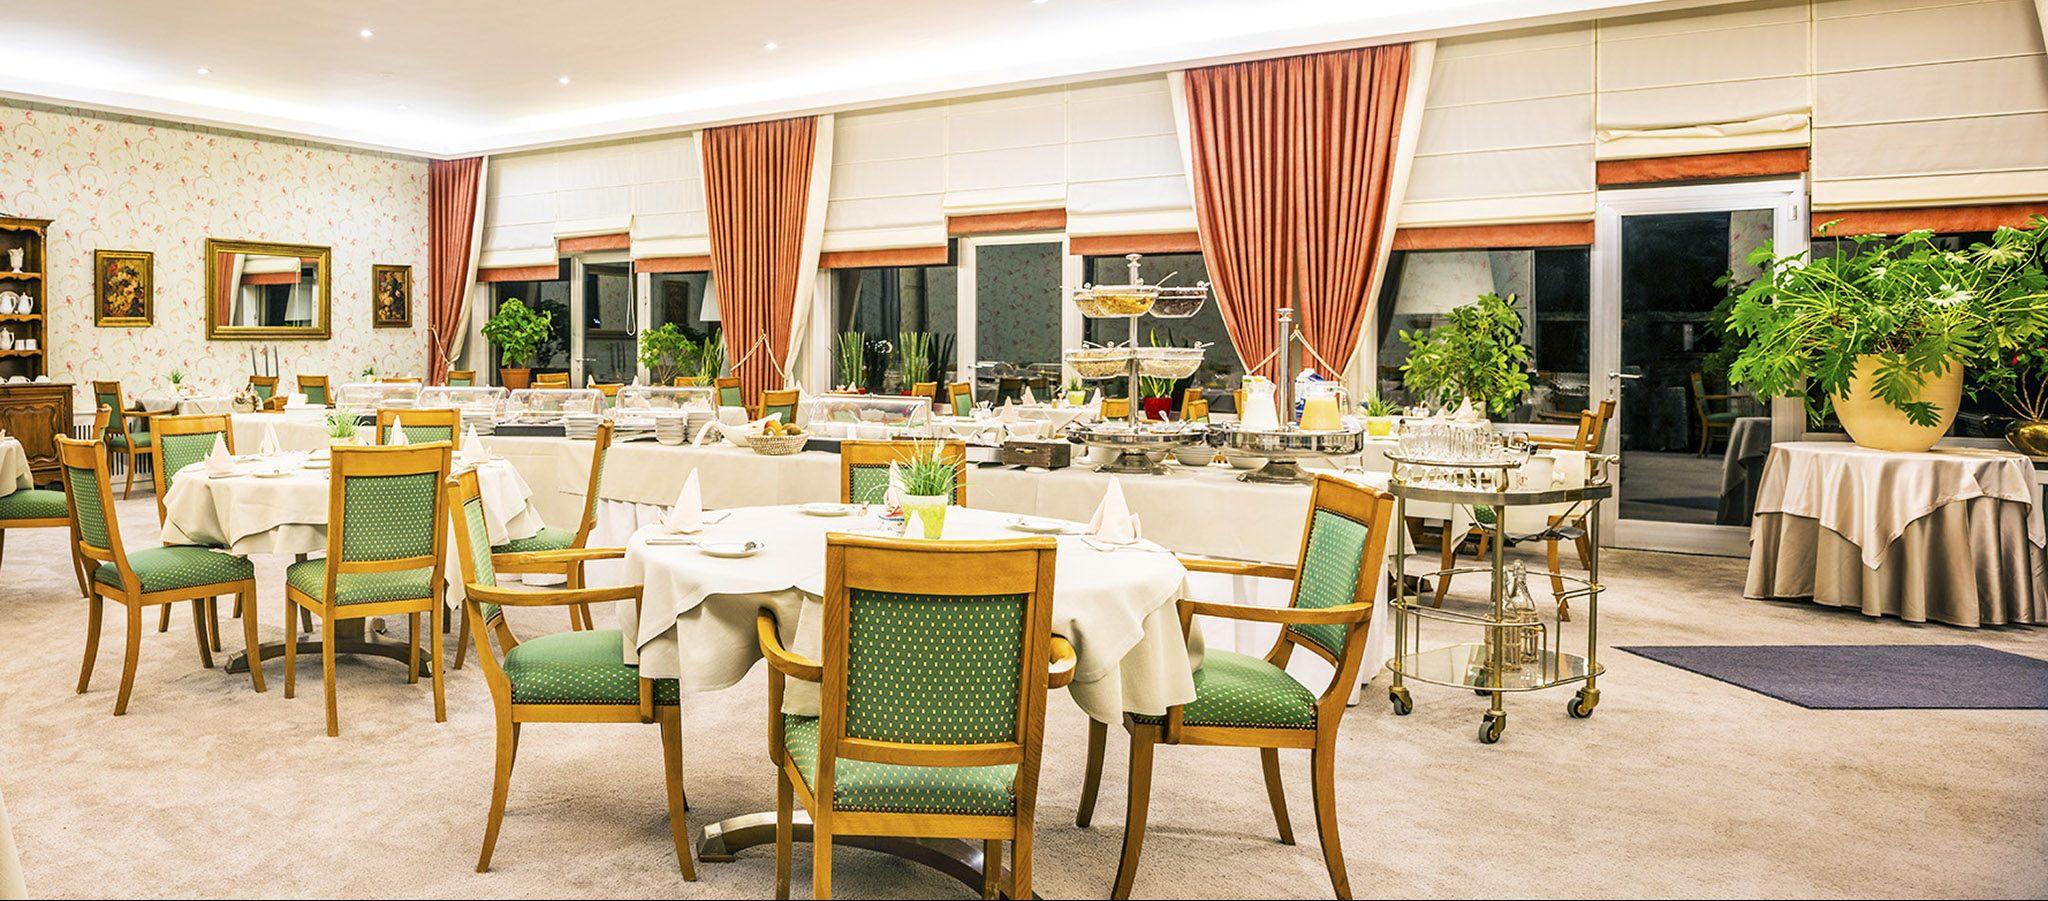 Les Terrasses Fleuries - Petit-Déjeuner Buffet